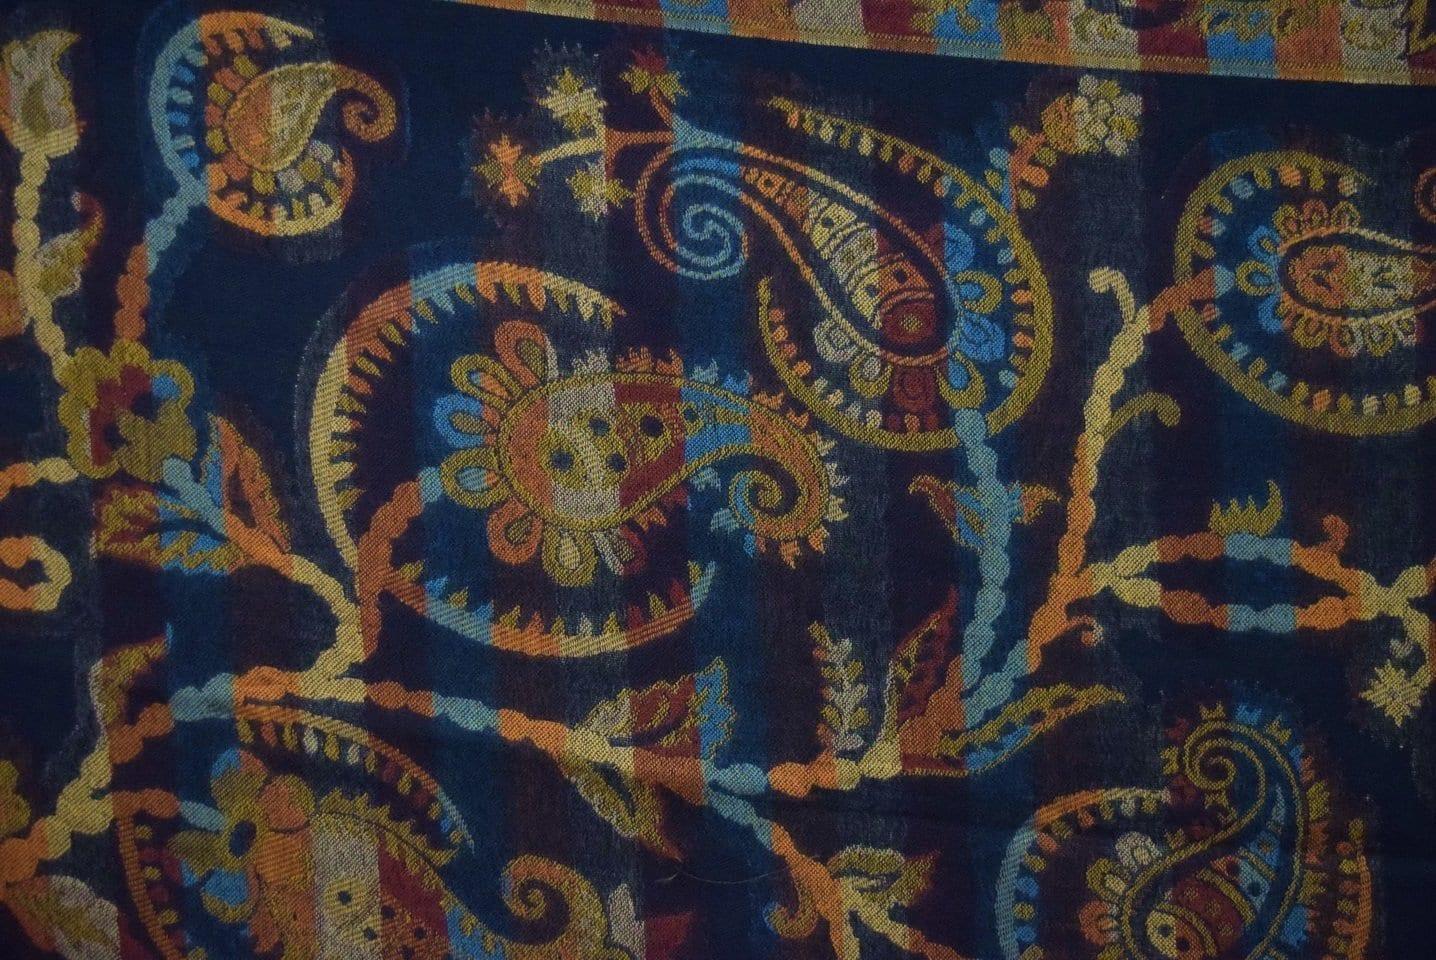 Black Kashmiri Shawl Kani Cutting Work pure wool Pashmina wrap C0659 2